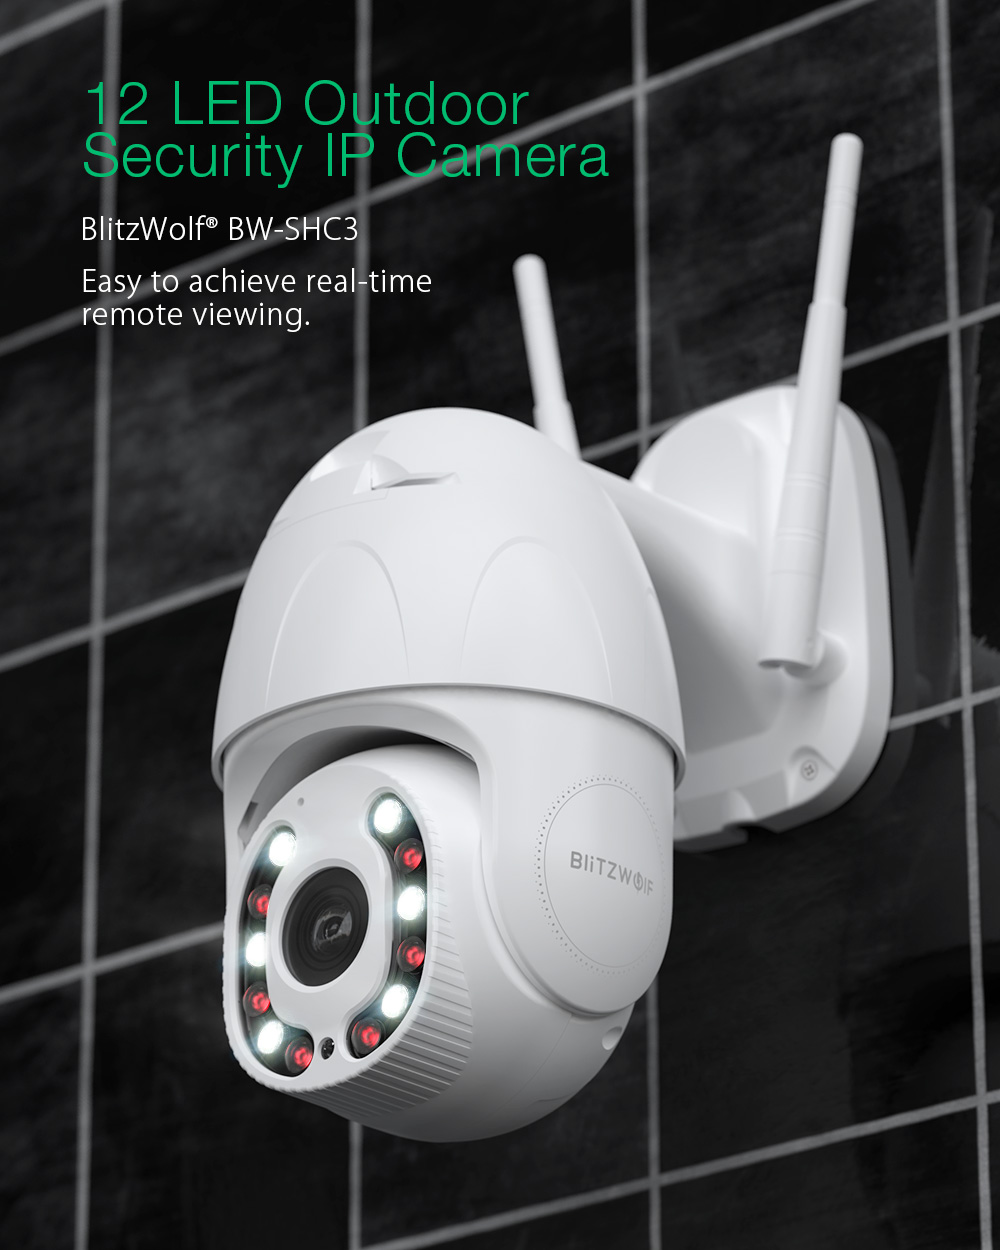 Blitzwolf BW-SHC3 Security IP camera